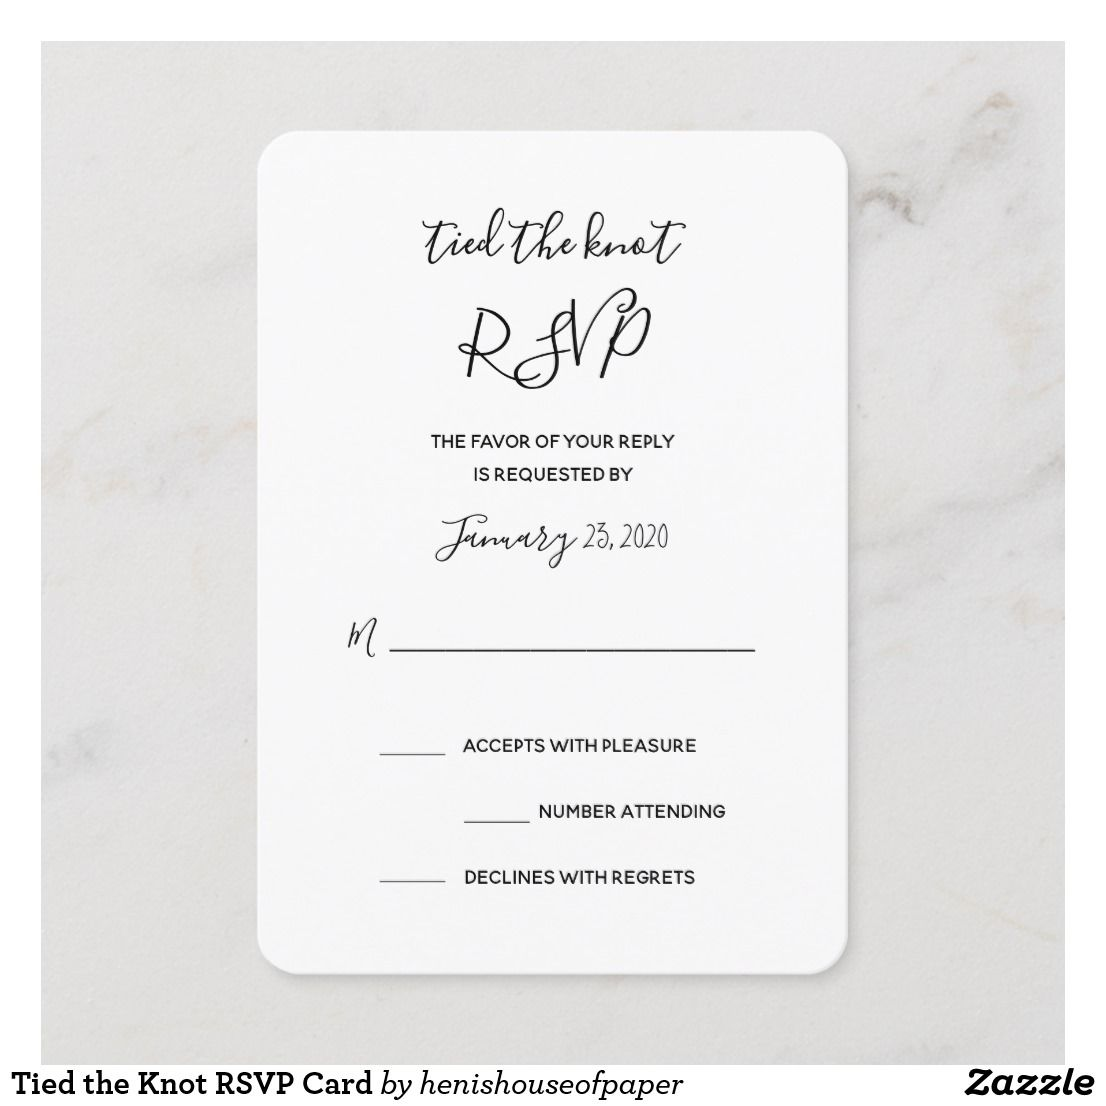 Tied The Knot Rsvp Card Zazzle Com Fun Wedding Invitations Fun Wedding Rsvp Rsvp Card